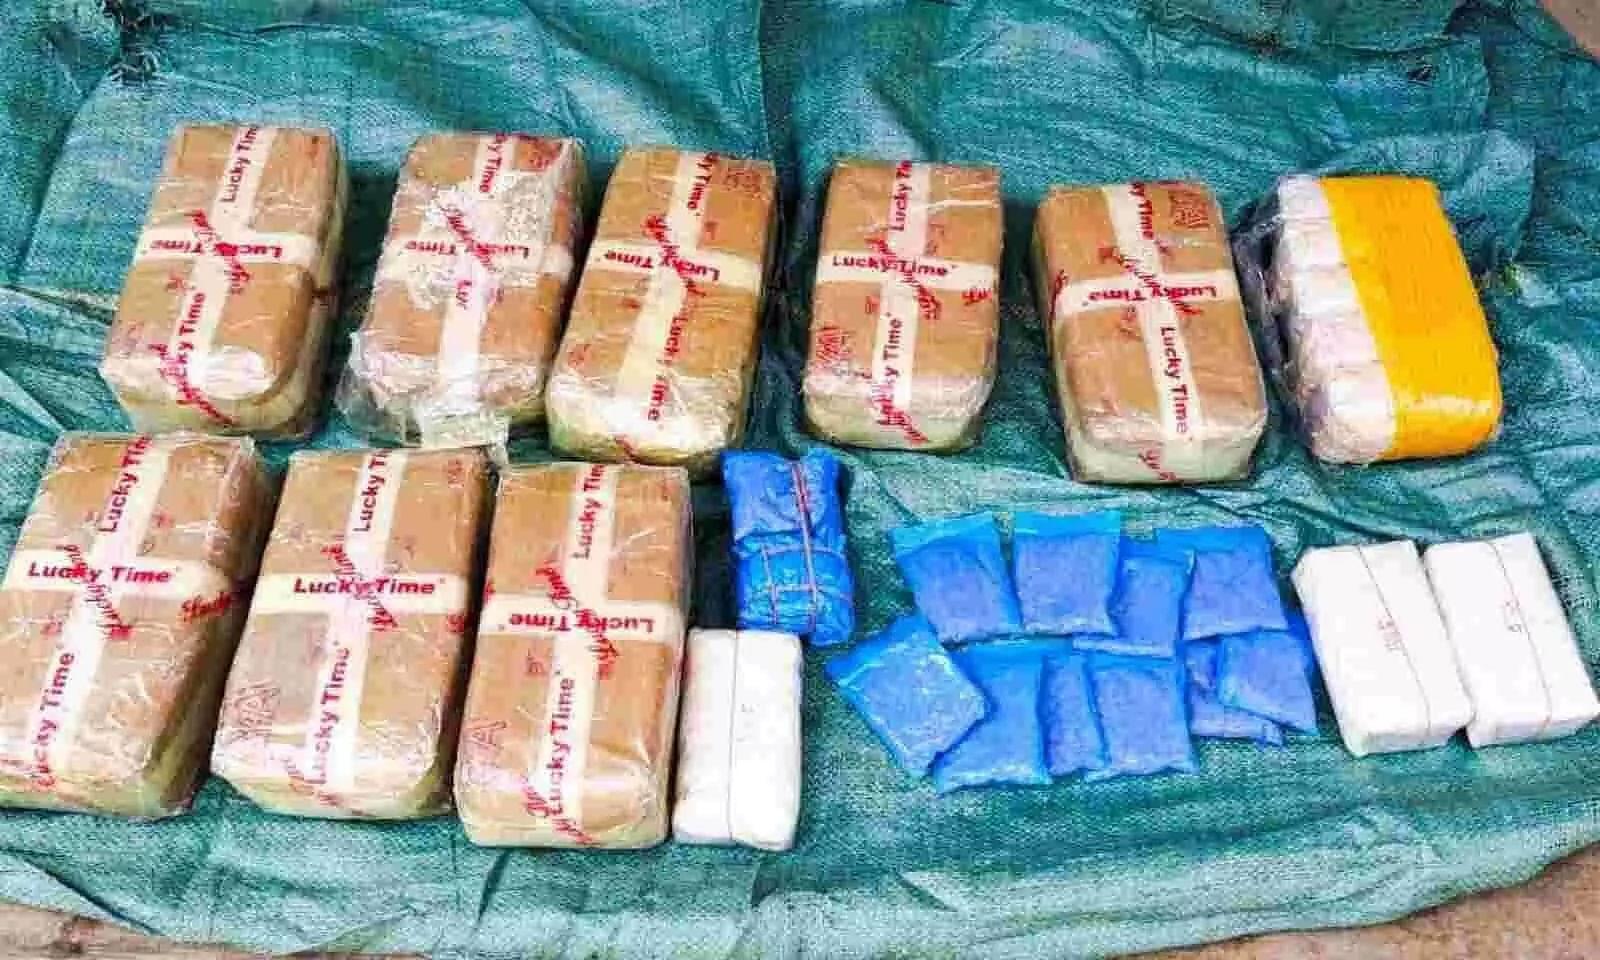 97,000 psychopathic Yaba tablets worth Rs 4 crore seized; 2 arrested in Bokajan